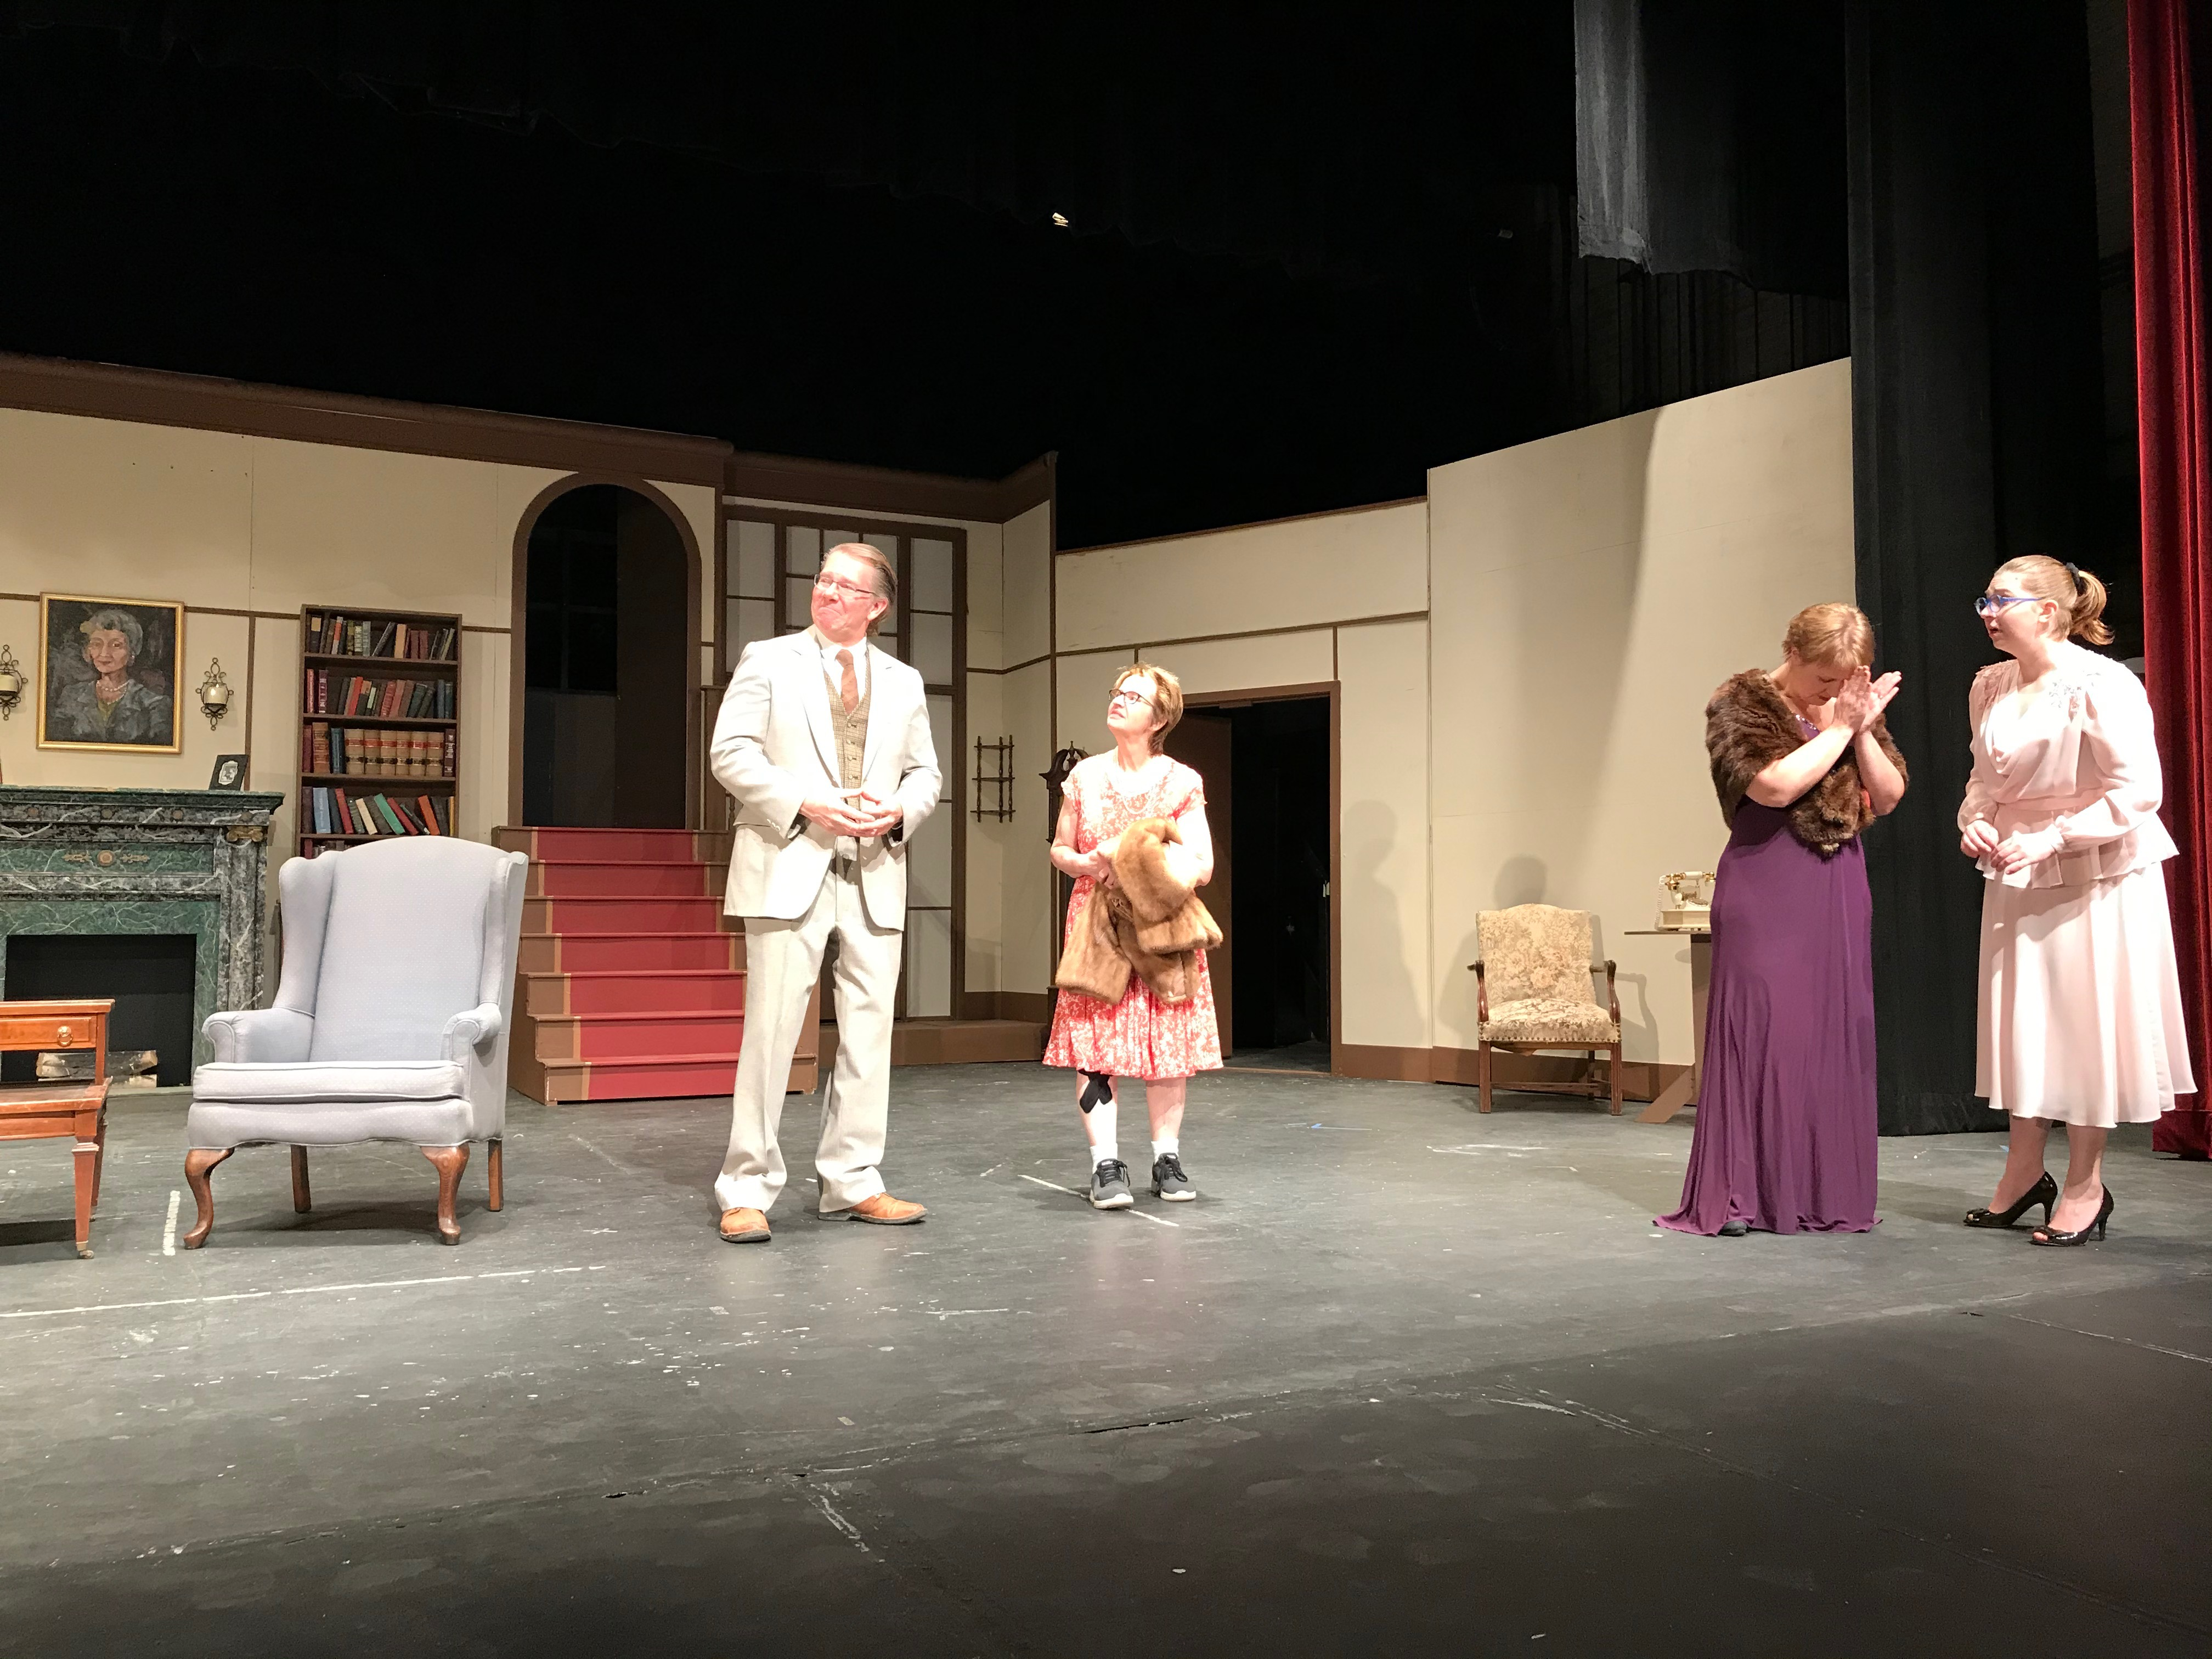 Harvey(invisible), Elwood, Mrs. Chauvenet, Veta, Myrtle Mae